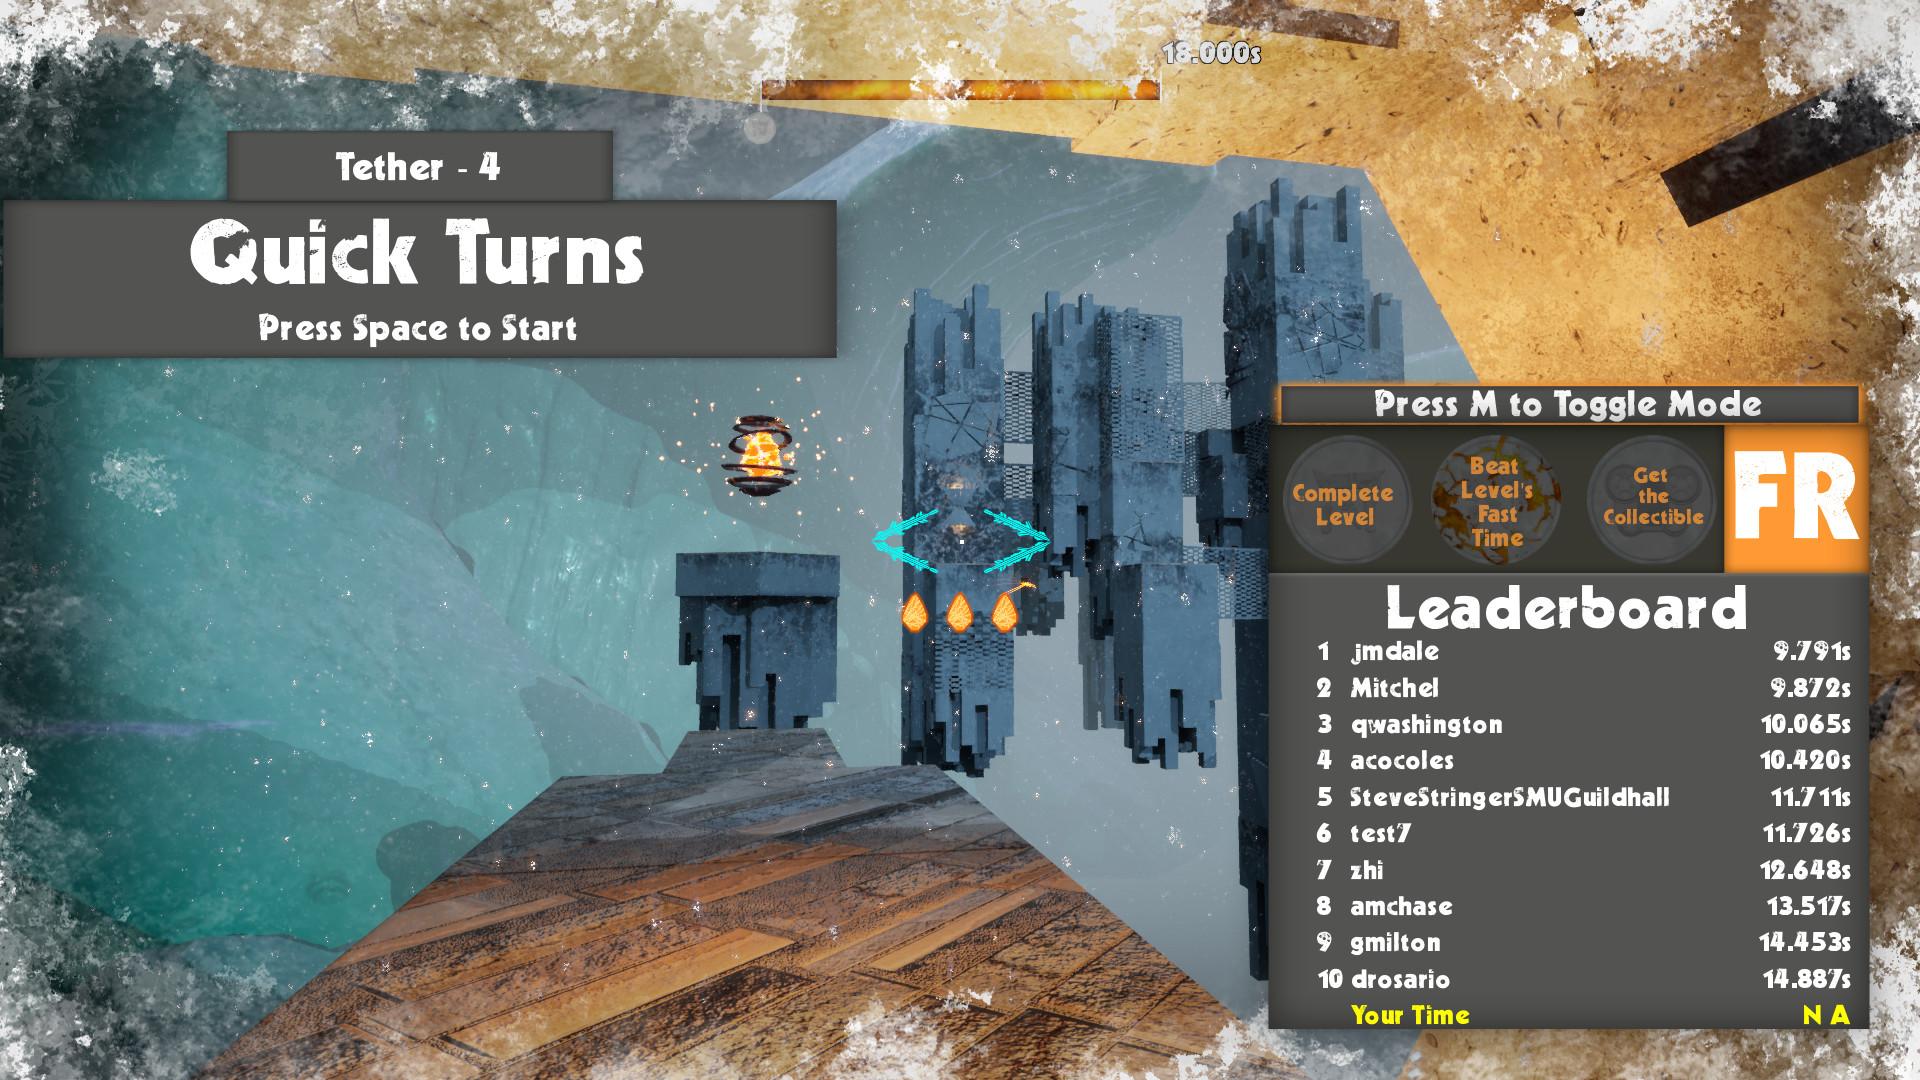 FrostRunner on Steam